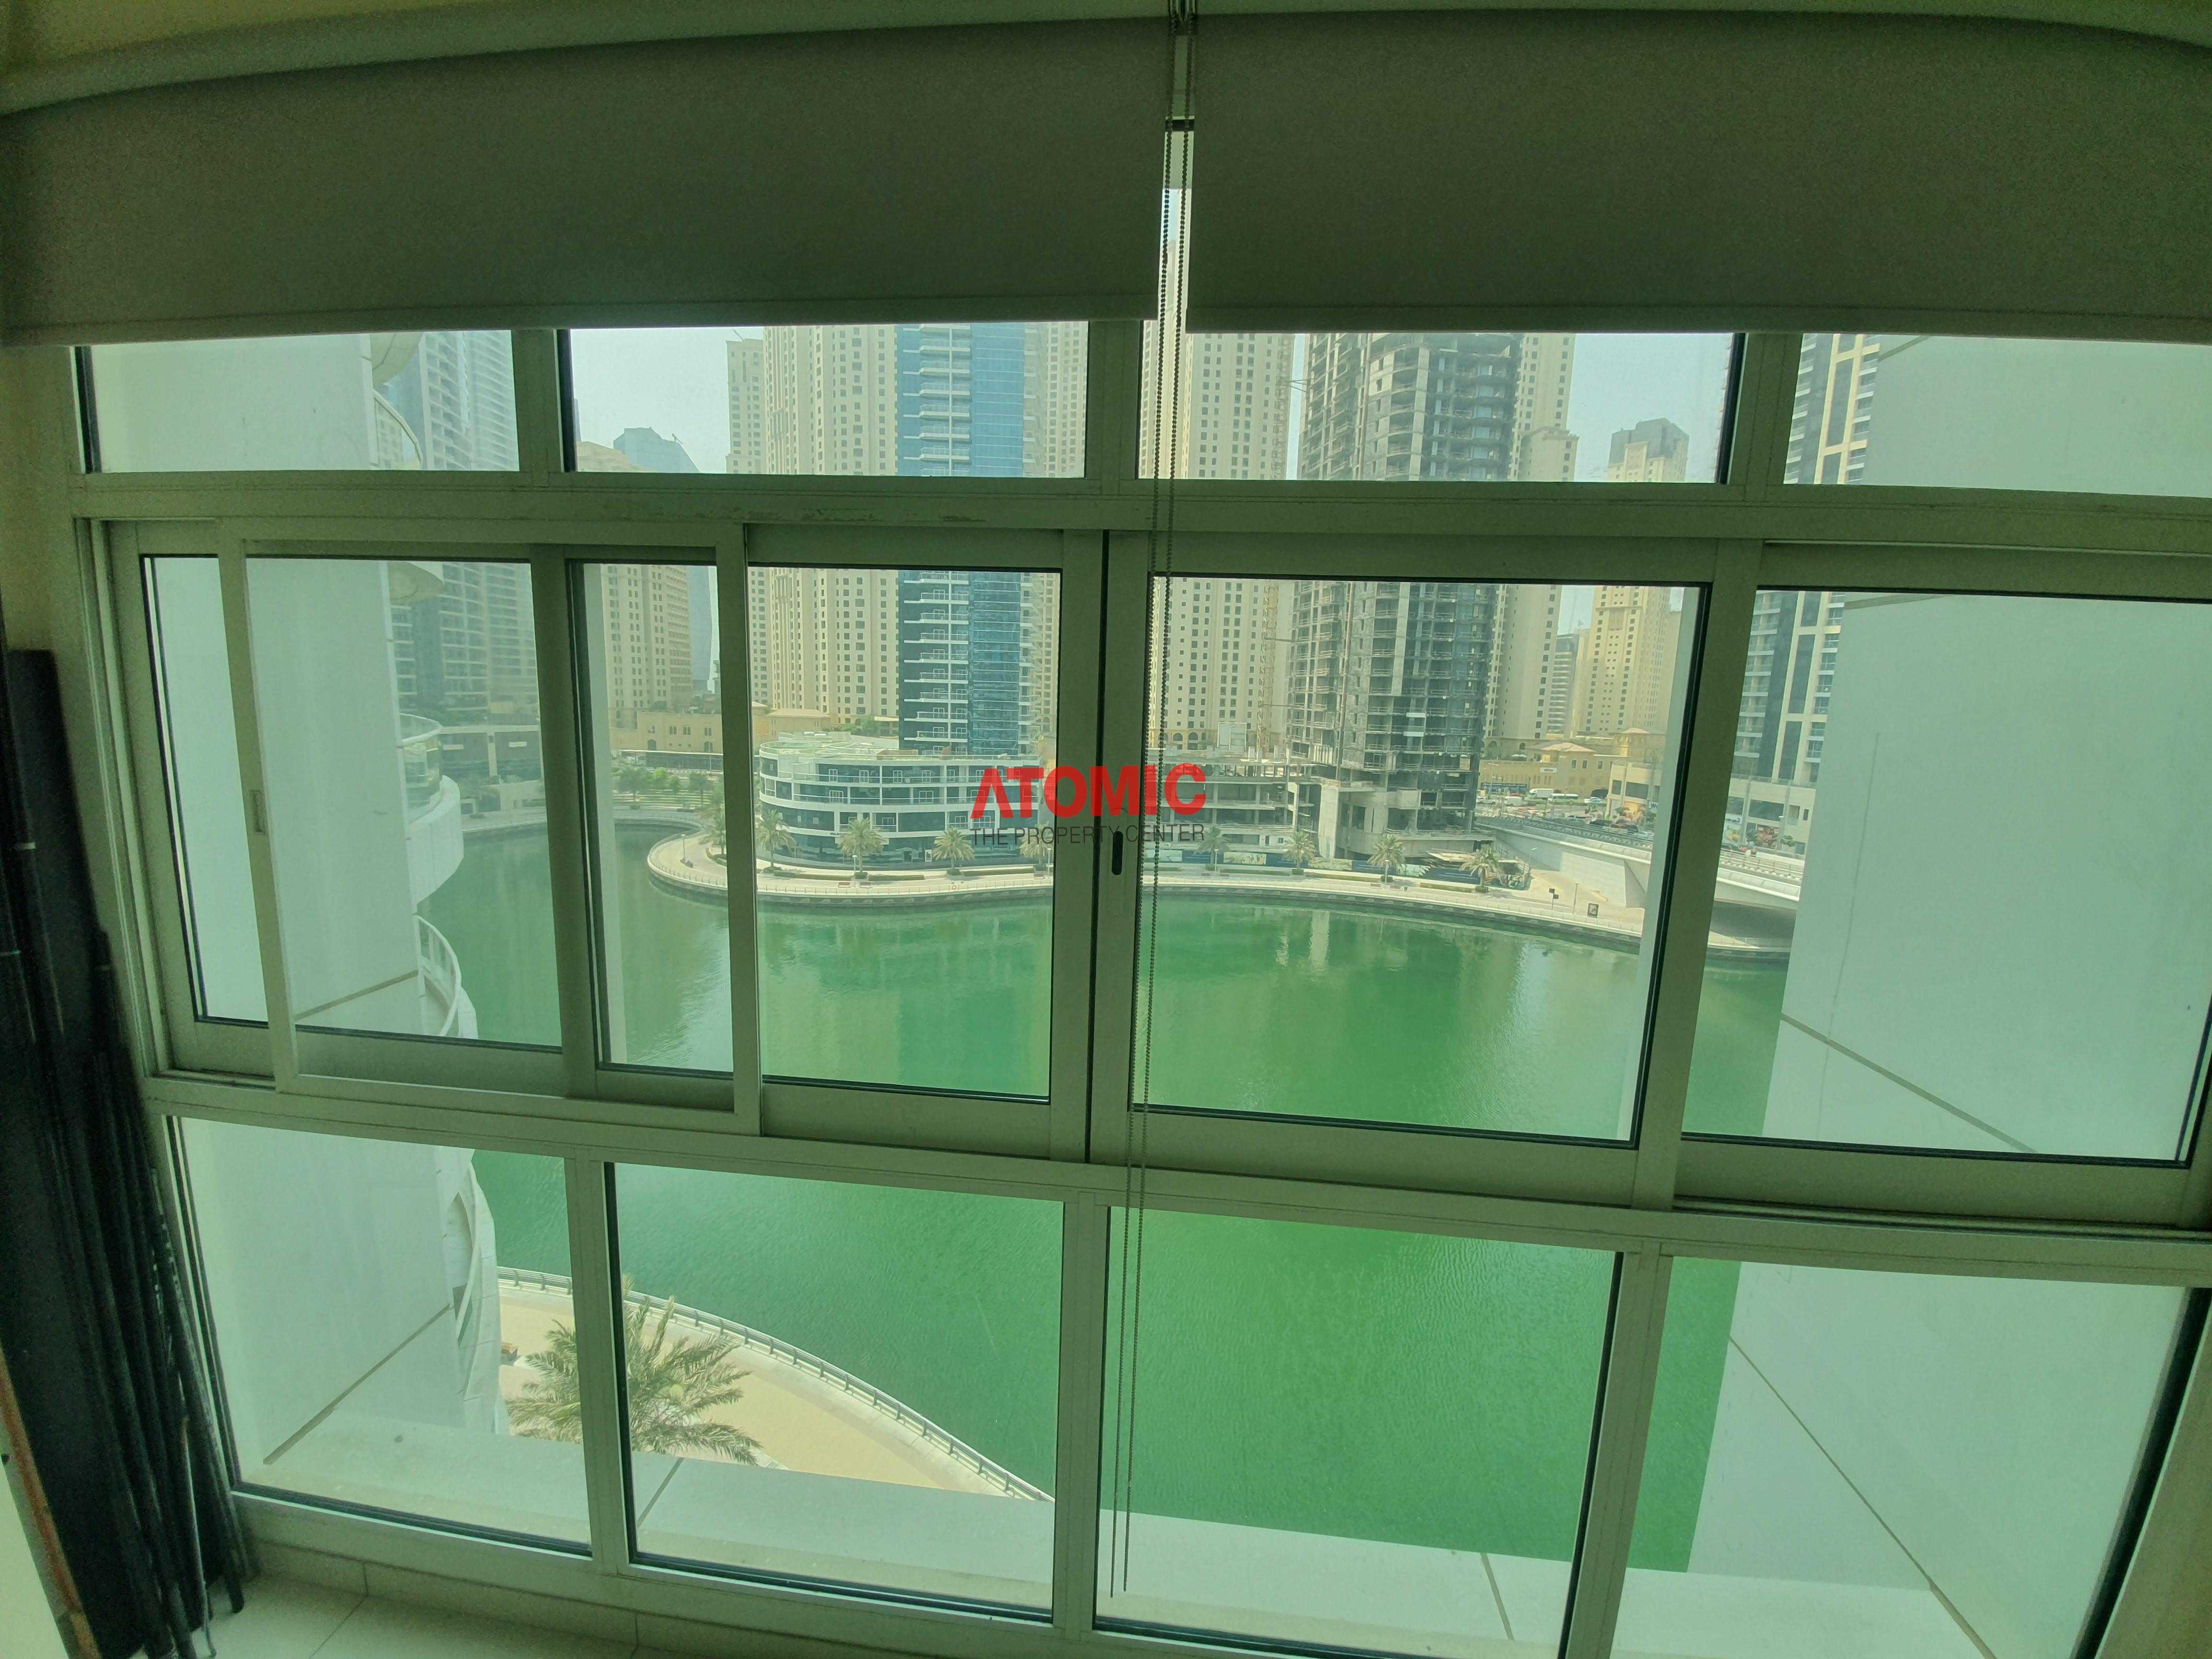 Full Marina View | Spacious and Bright 1 BR